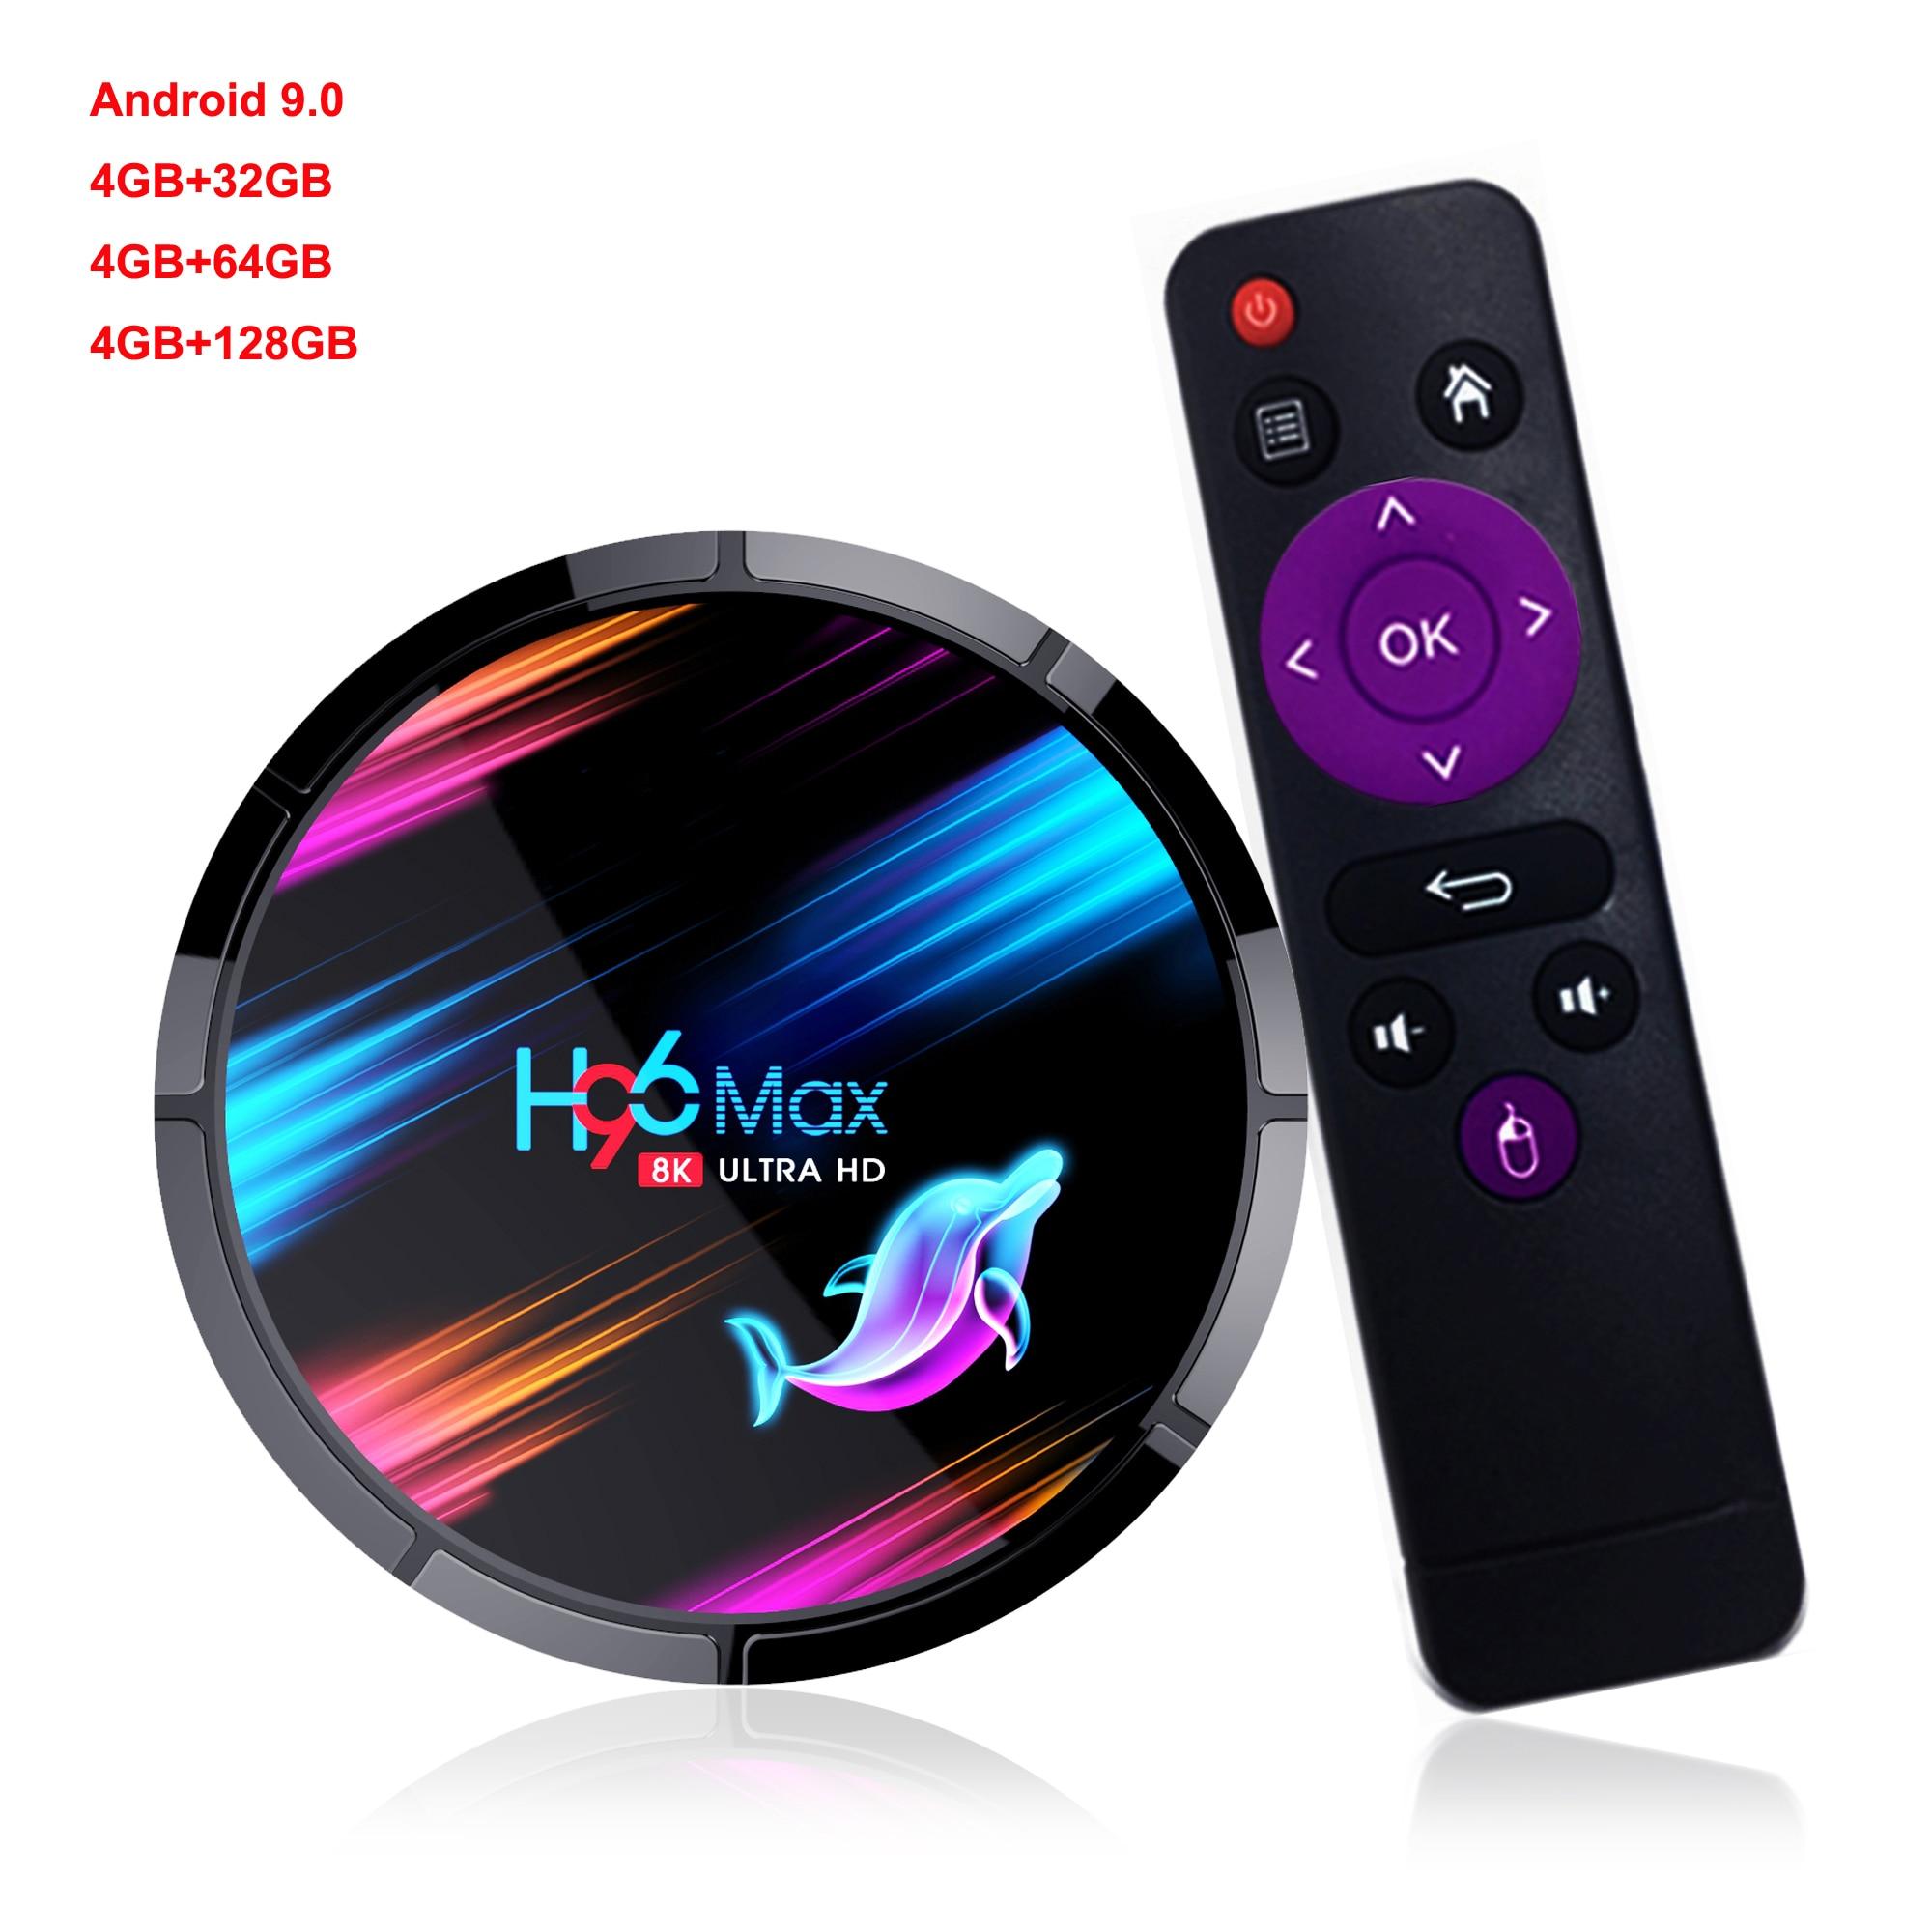 New Amlogic S905X3 Quad Core Android 9.0 Smart TV Box Support USB WIFI Bluetooth